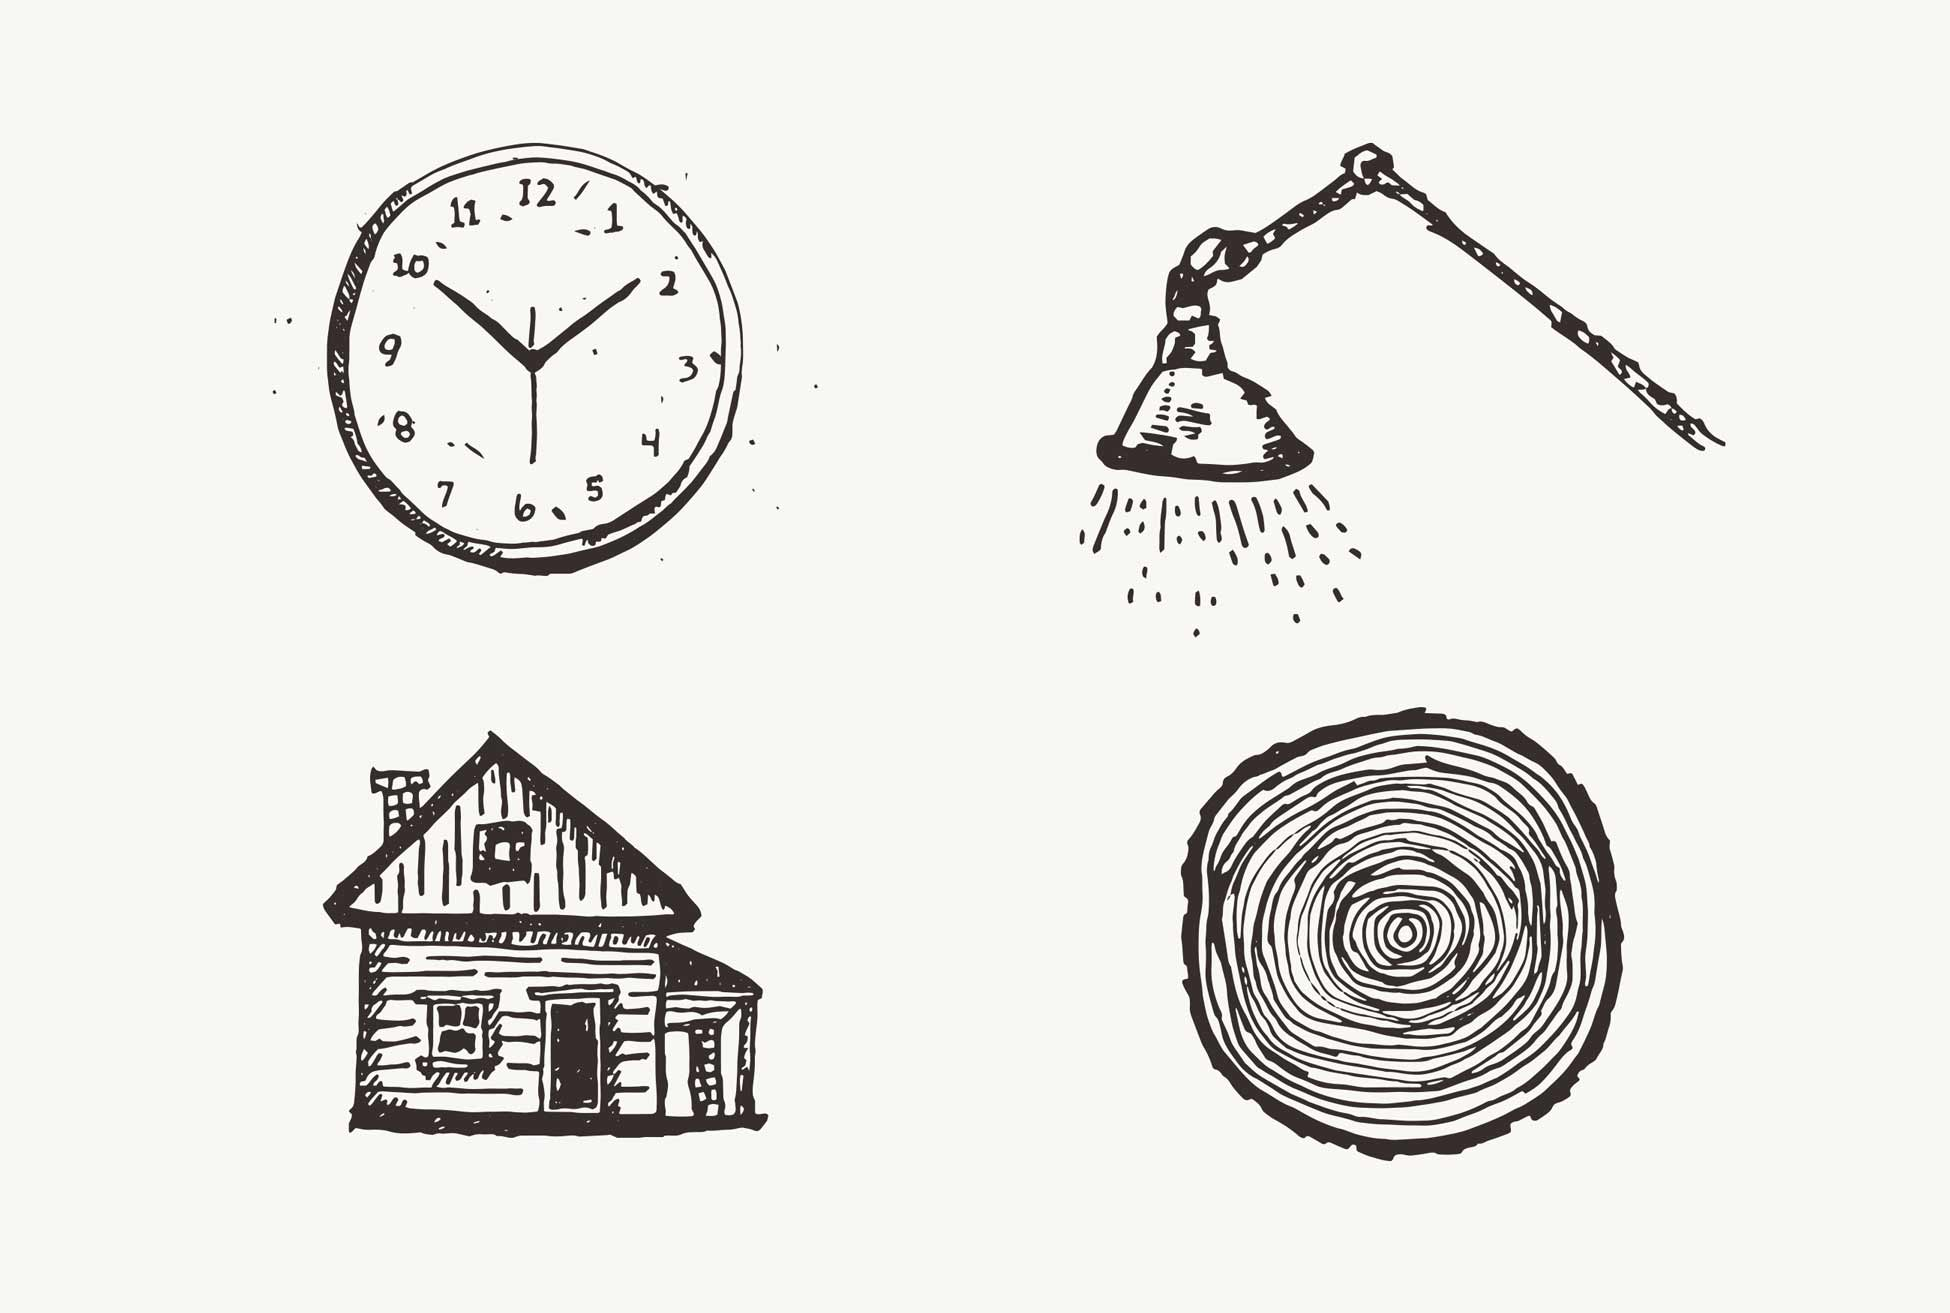 theworklodge_illustrations.jpg